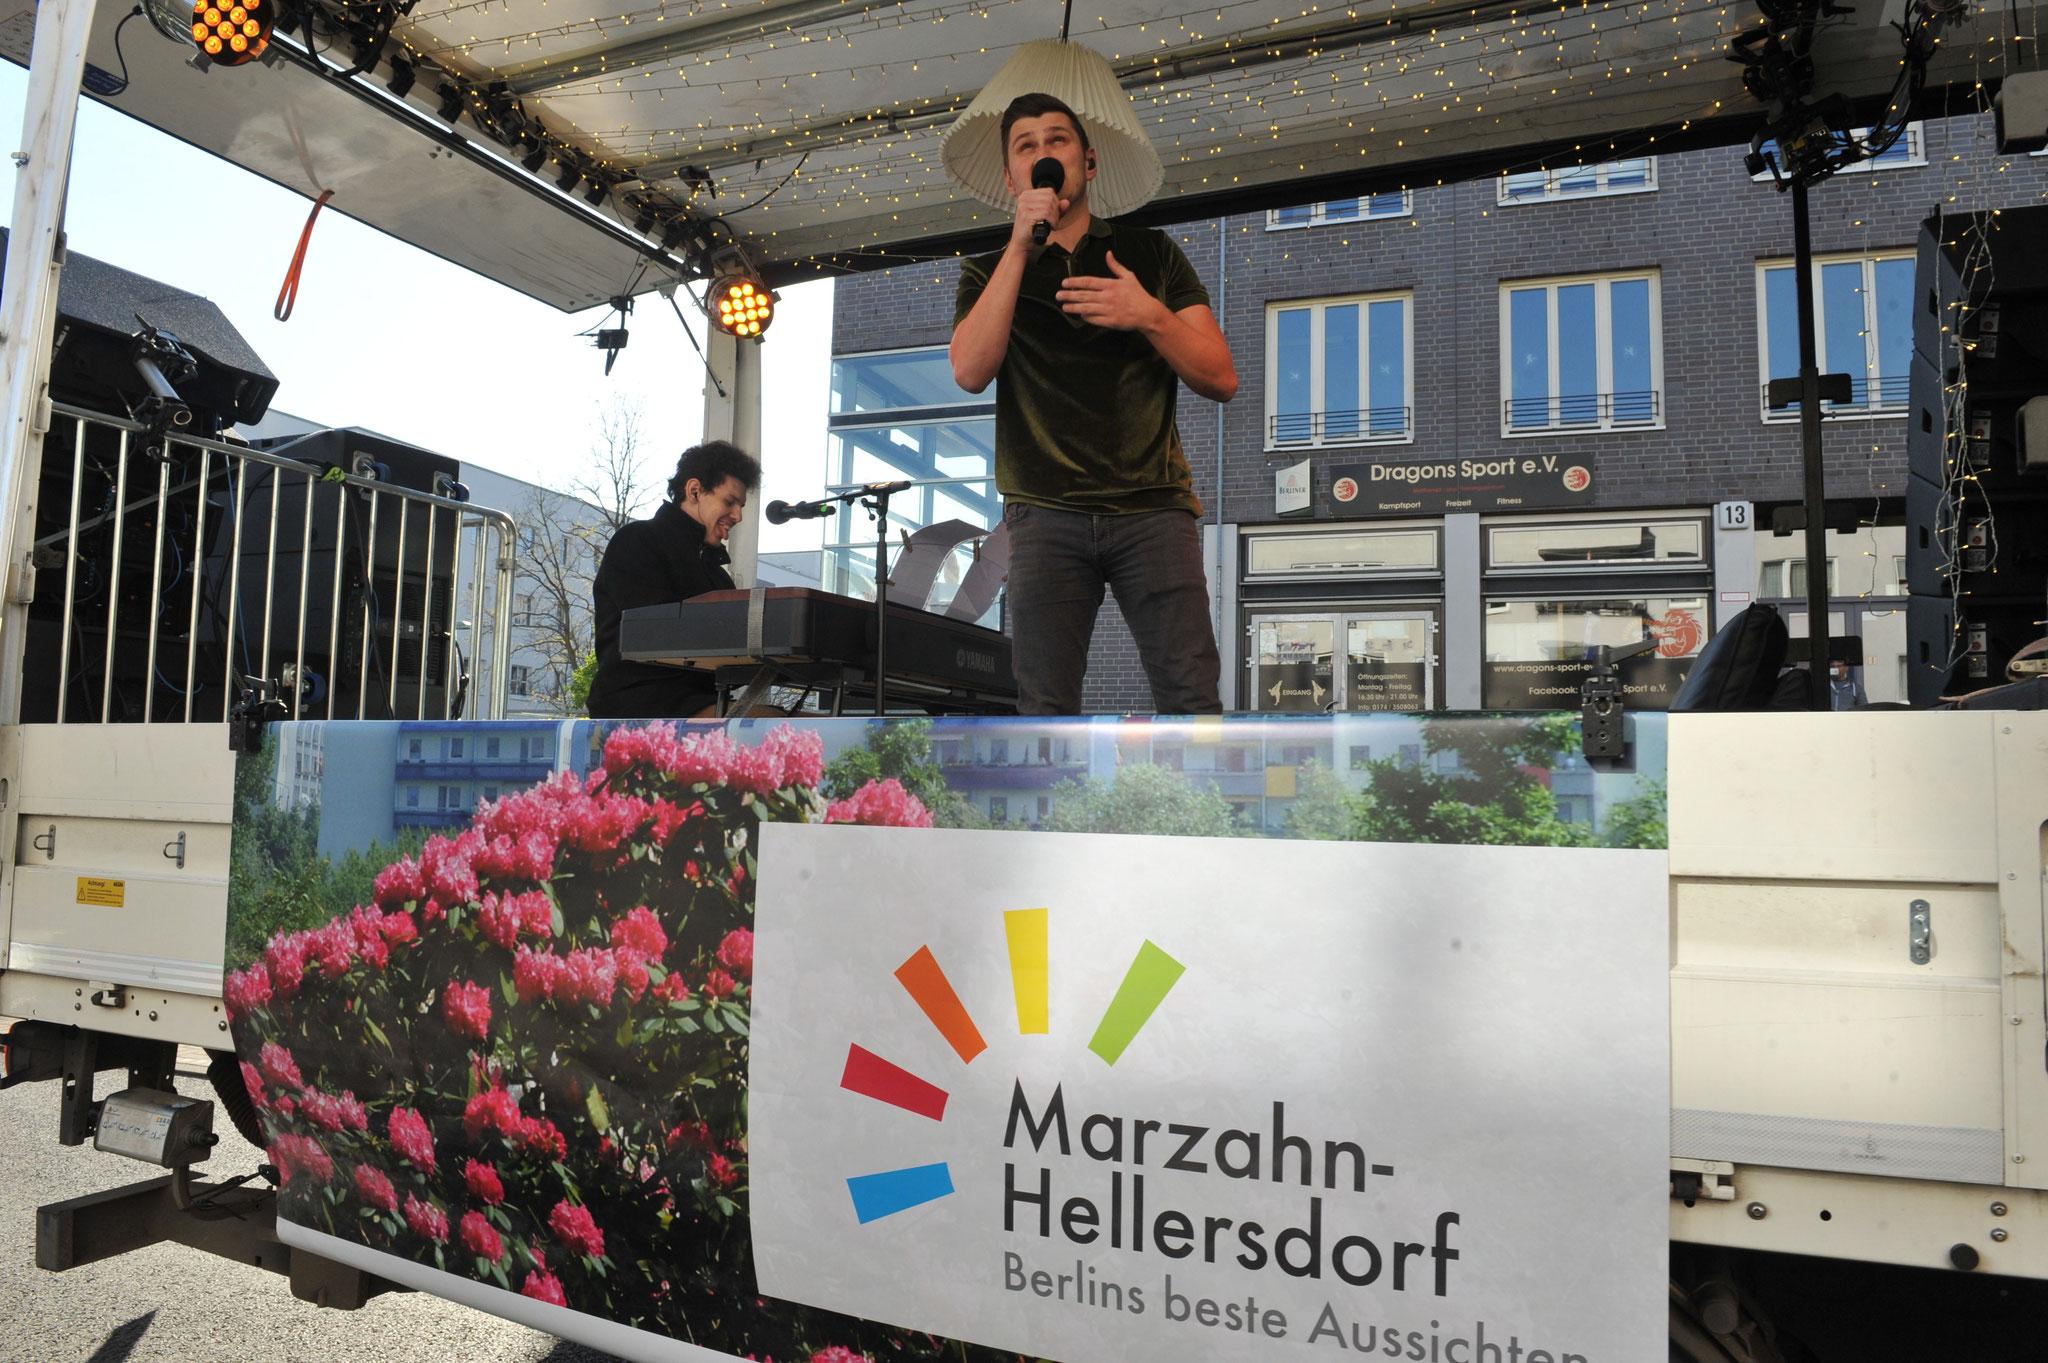 Schön war's. © pressefoto-uhlemann.de